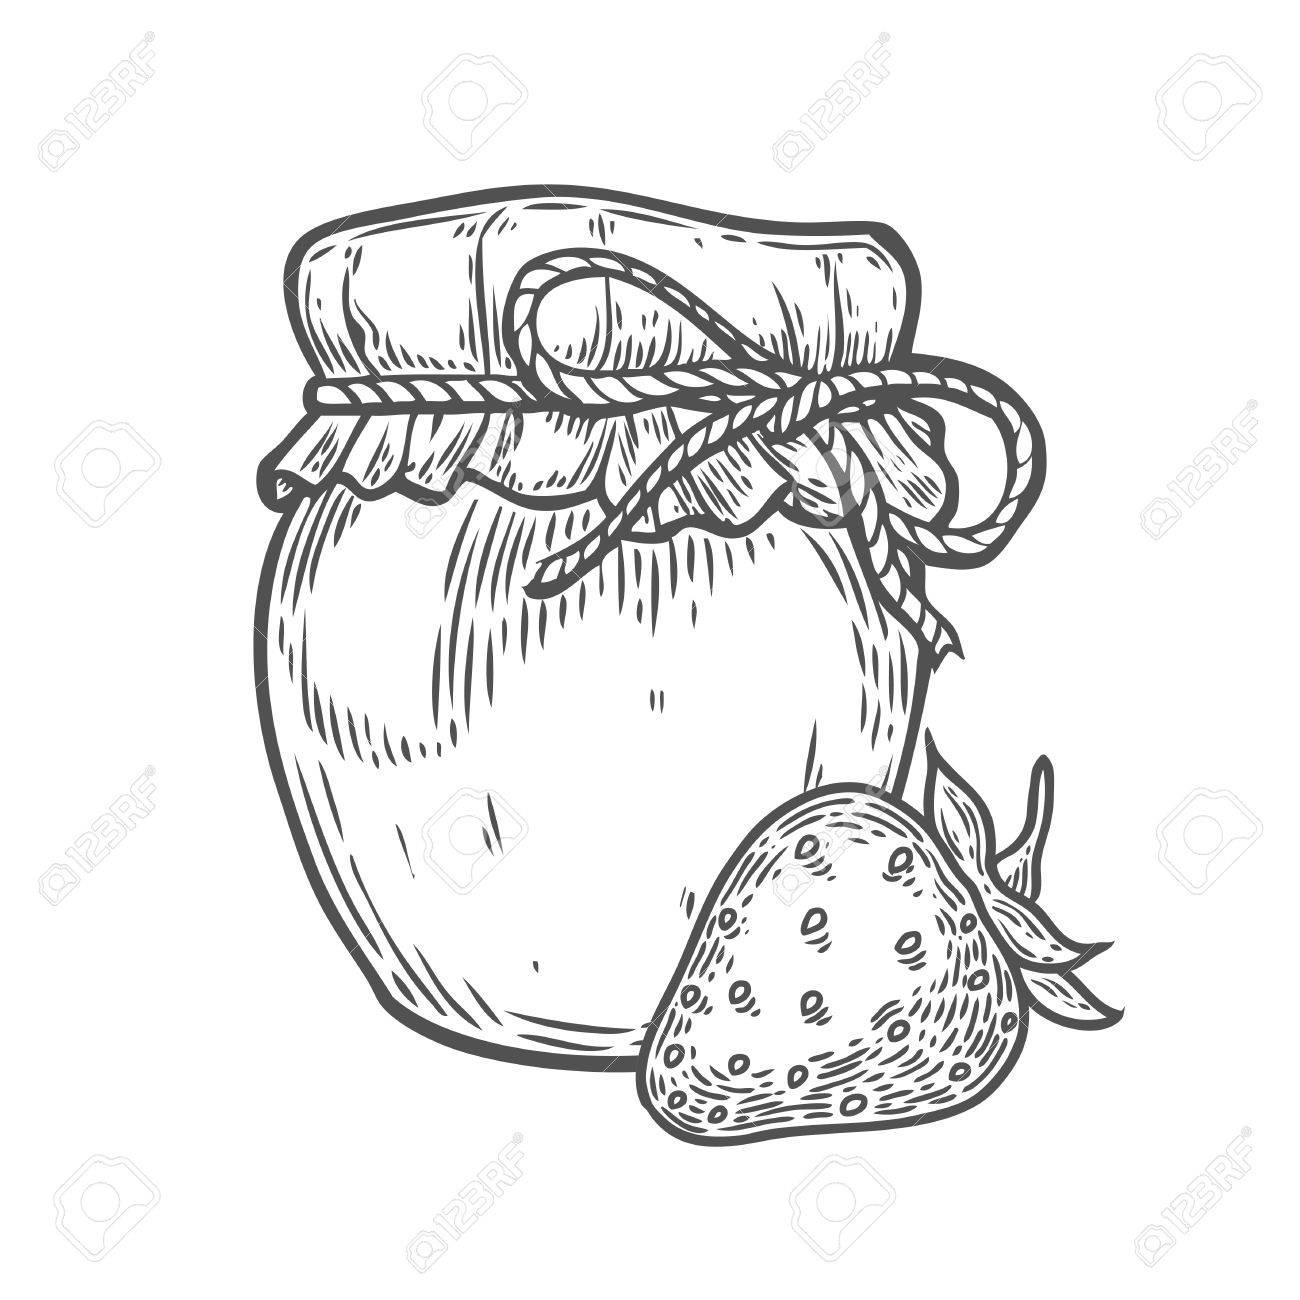 1300x1300 Strawberry Jam Jar Ink Hand Drawn Vector Illustration. Harvest